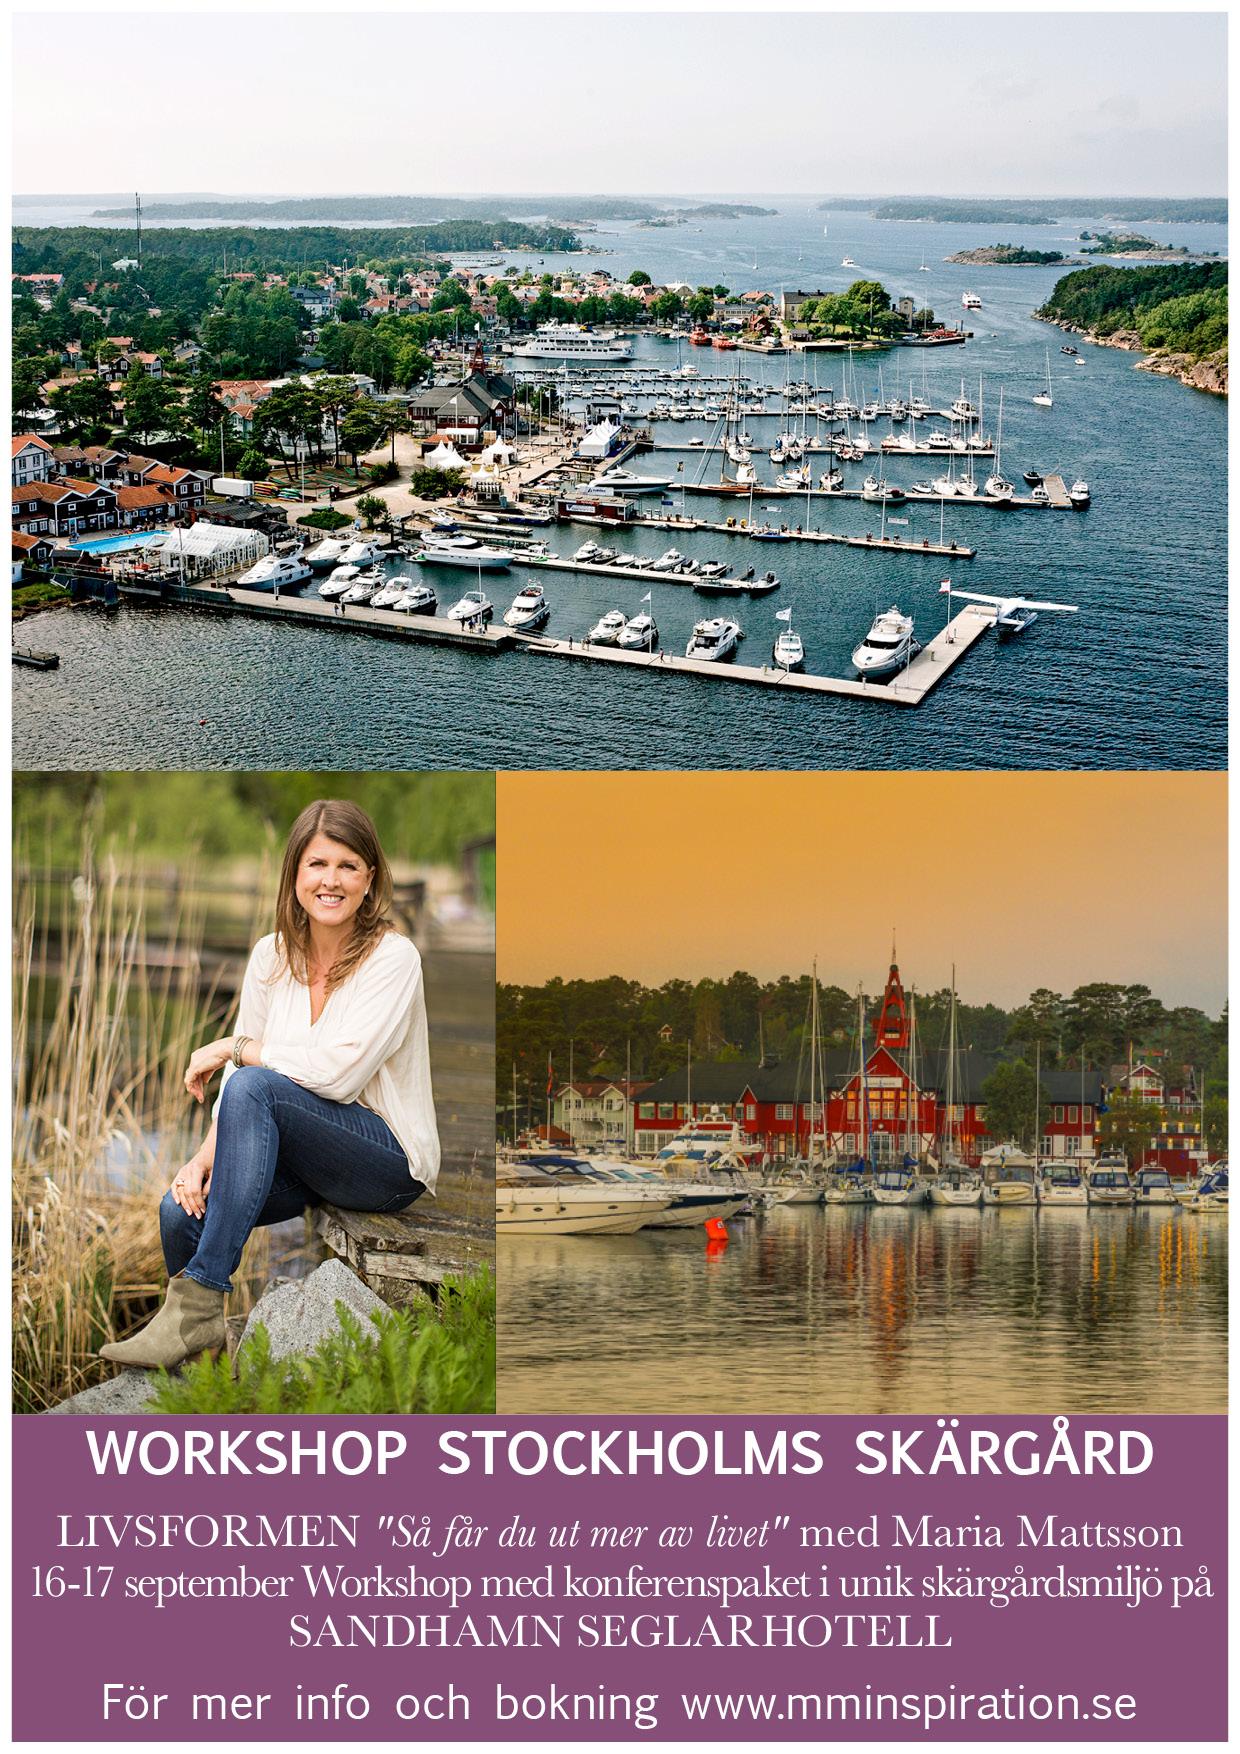 annons Sandhamn 2016-09